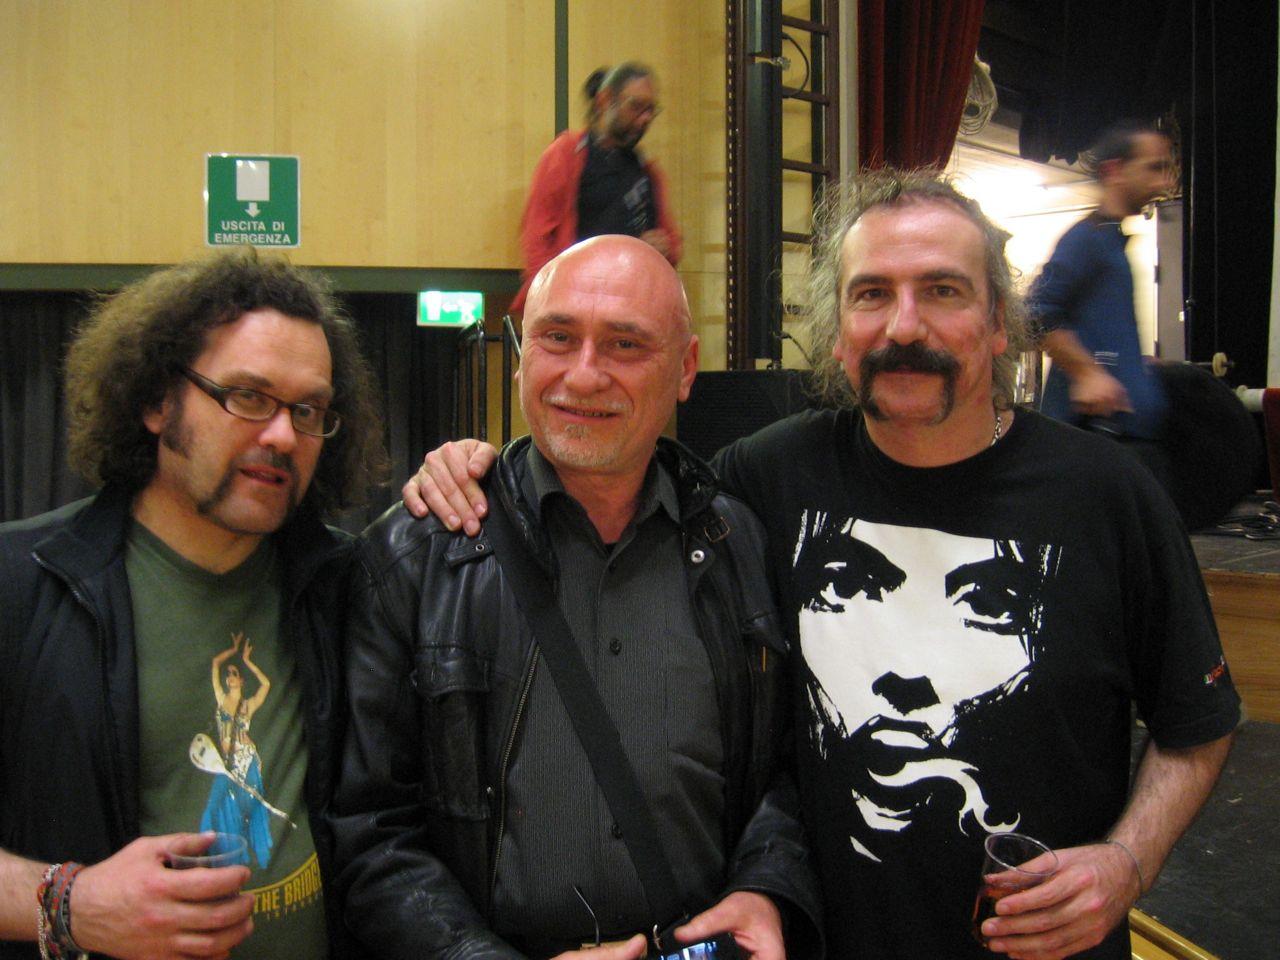 Baba Zula Giorgio Bertozzi Neoartgallery 01